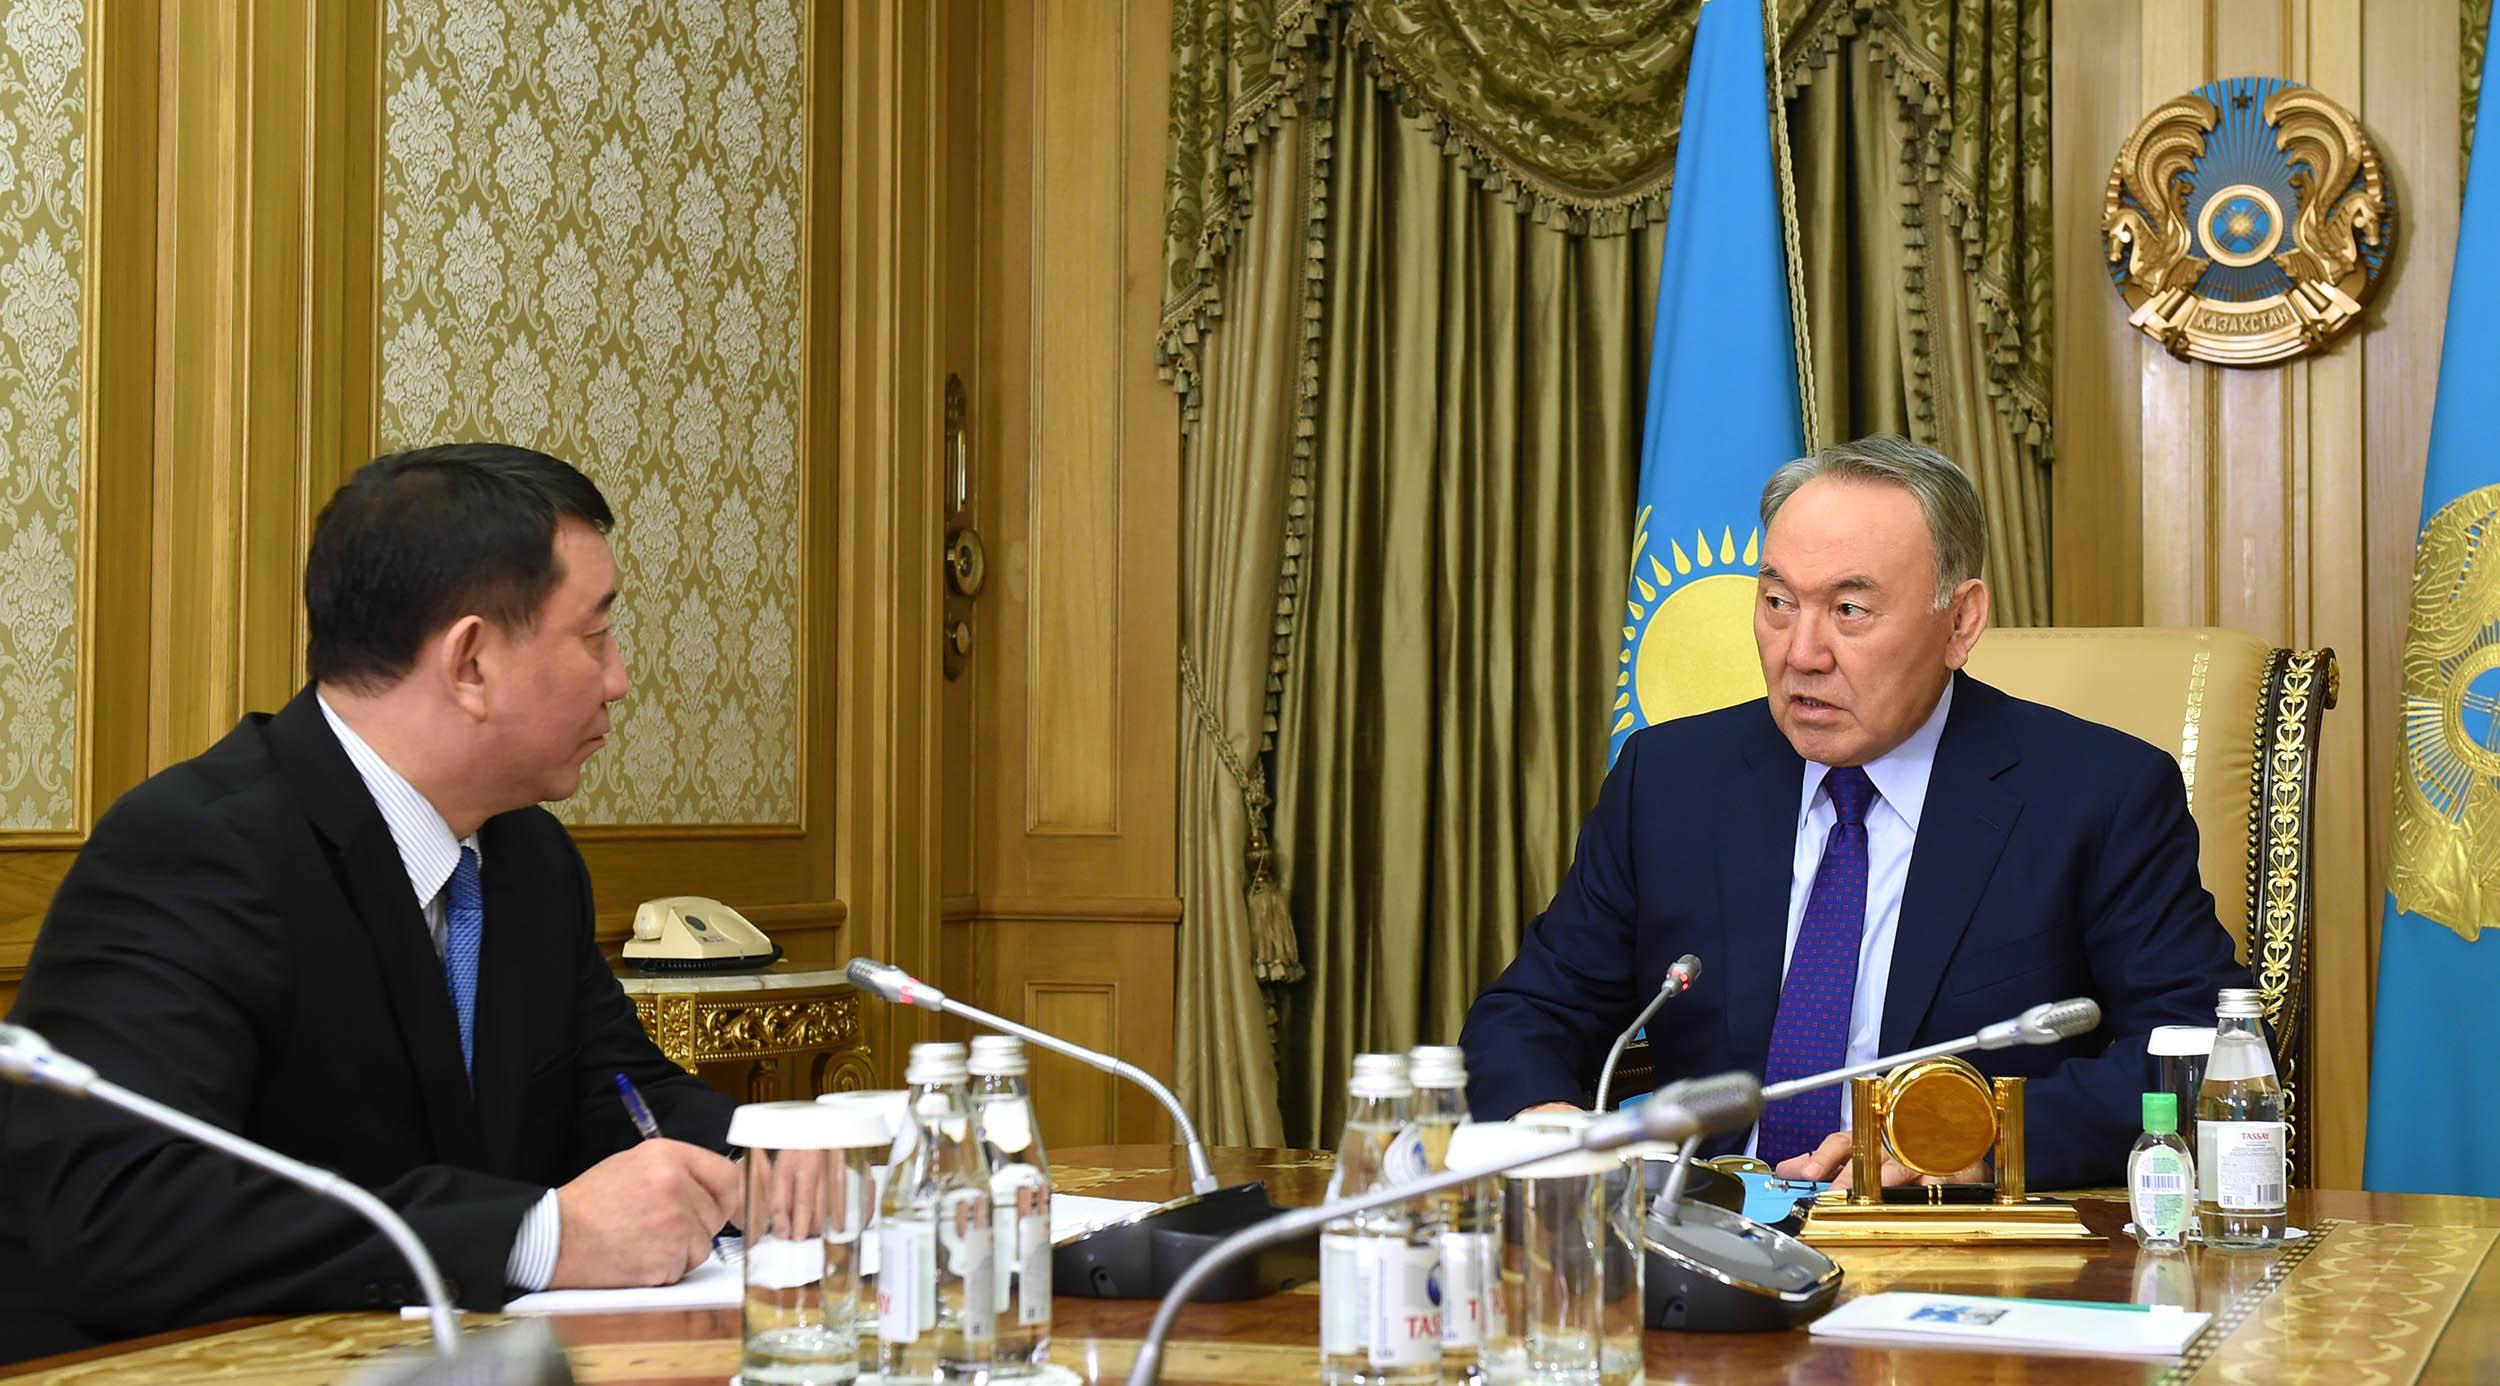 Ғабит Байжанов пен Нұрсұлтан Назарбаев